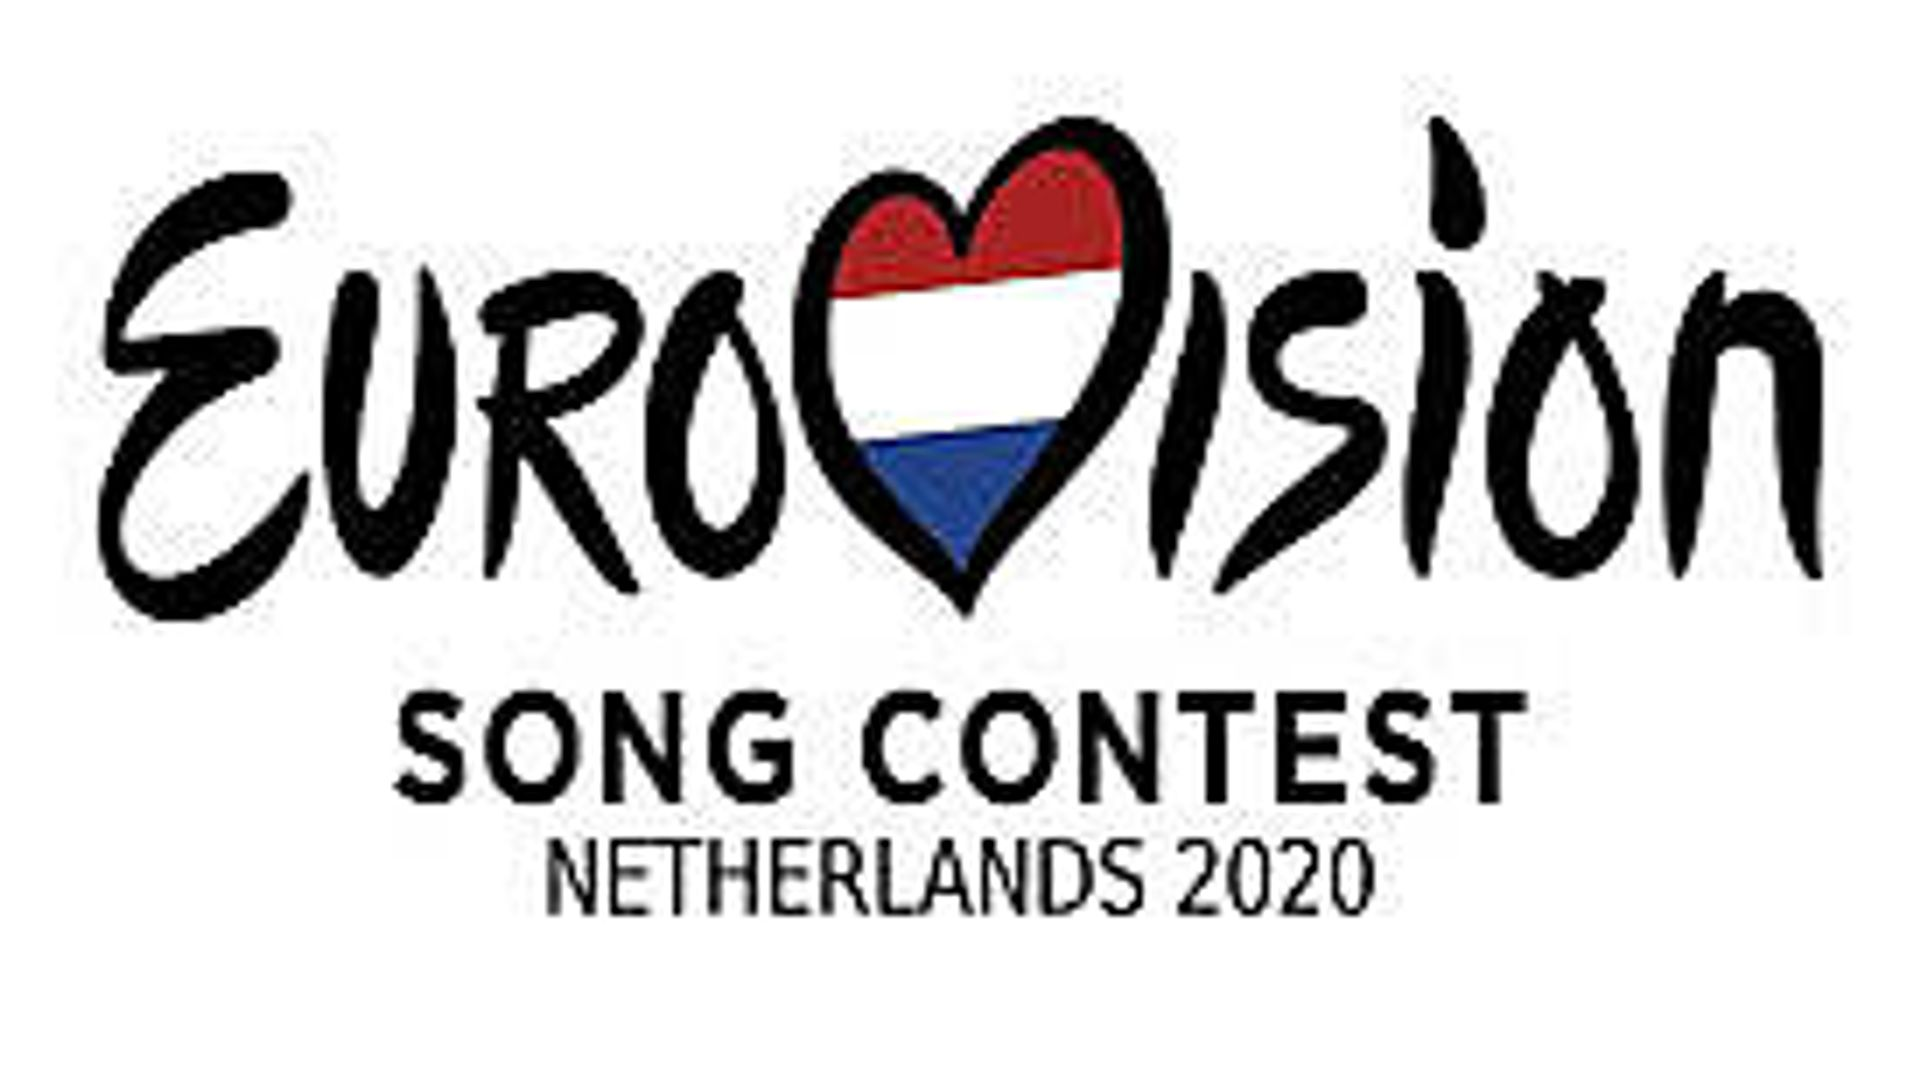 010719 songfestival.jpg